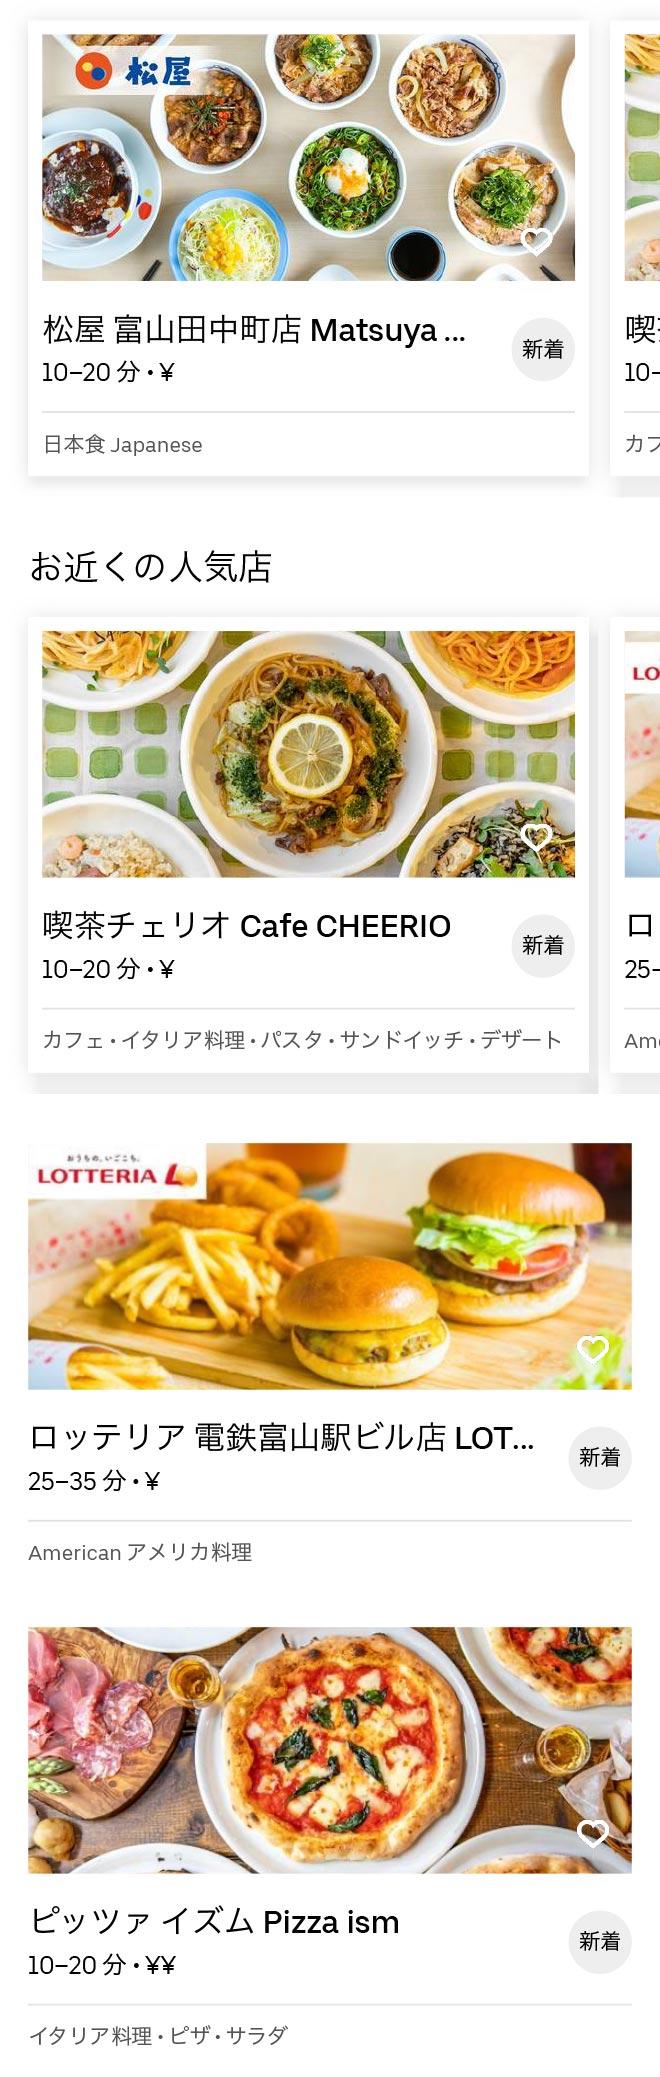 Toyama menu 2004 01